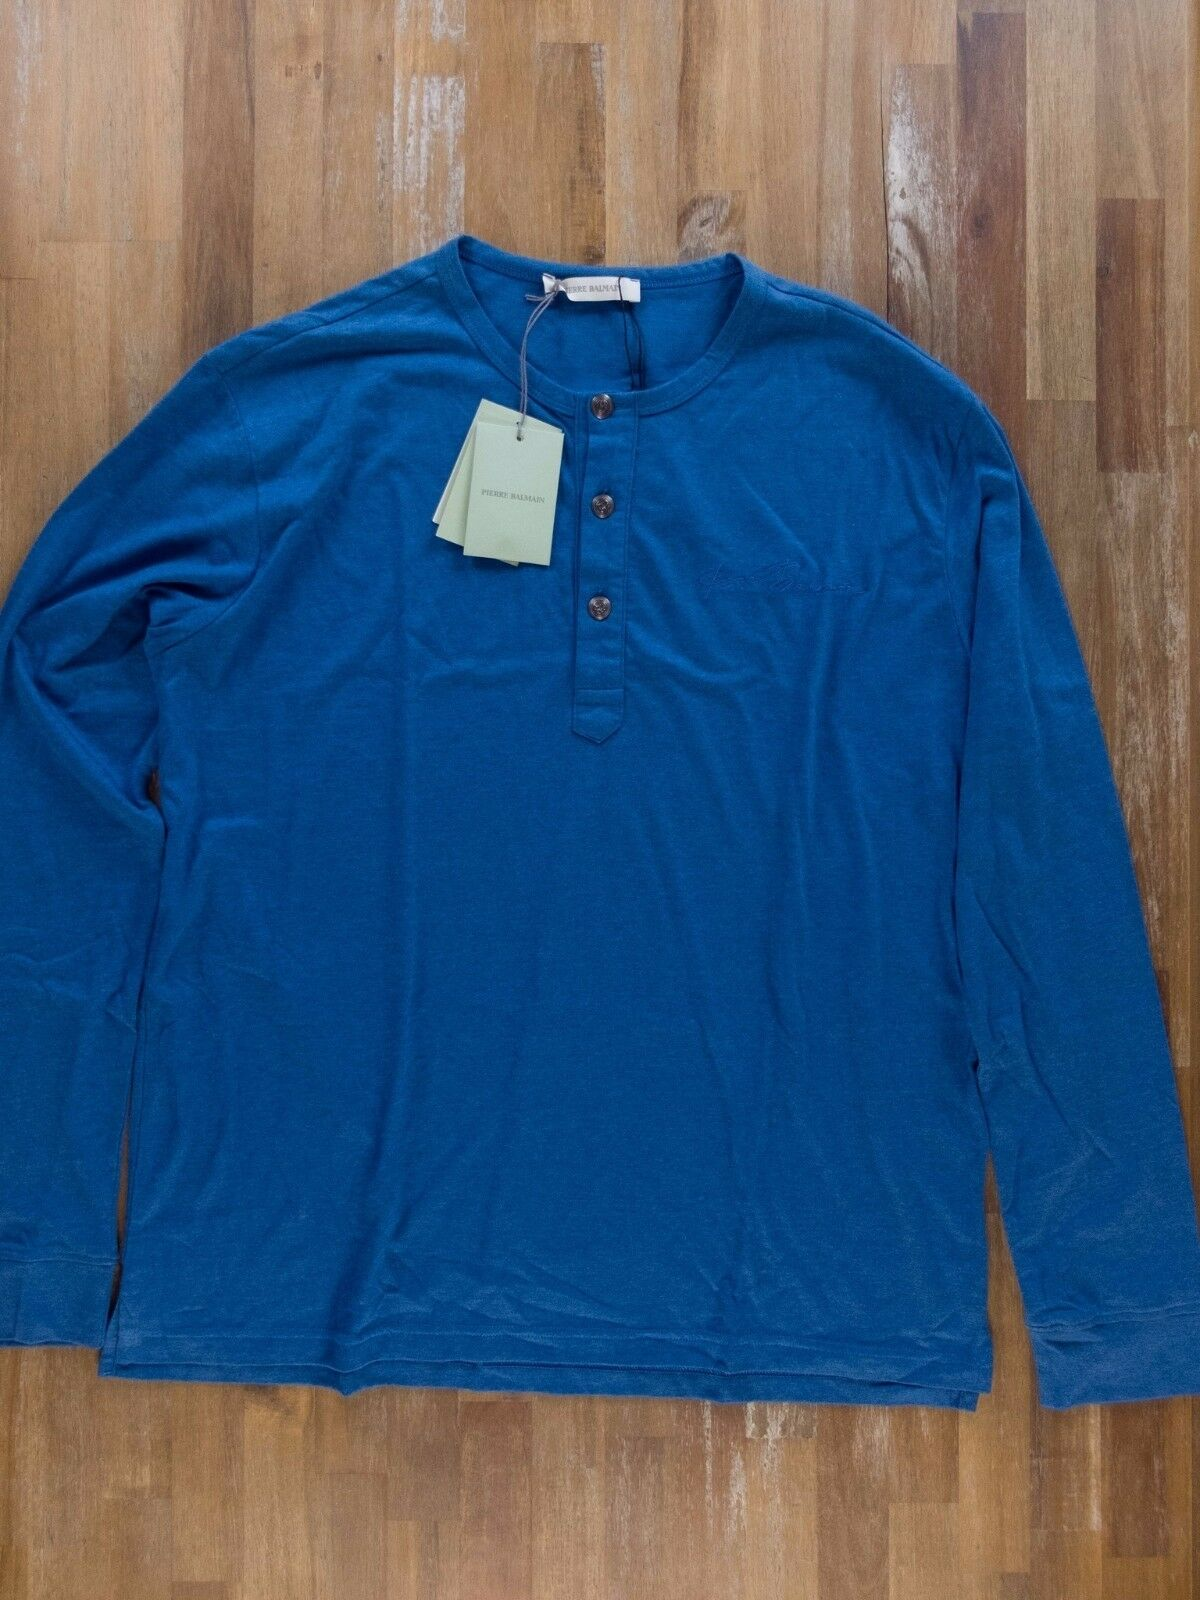 PIERRE BALMAIN bluee long-sleeve t-shirt authentic - Size 52 EU   XL - NWT